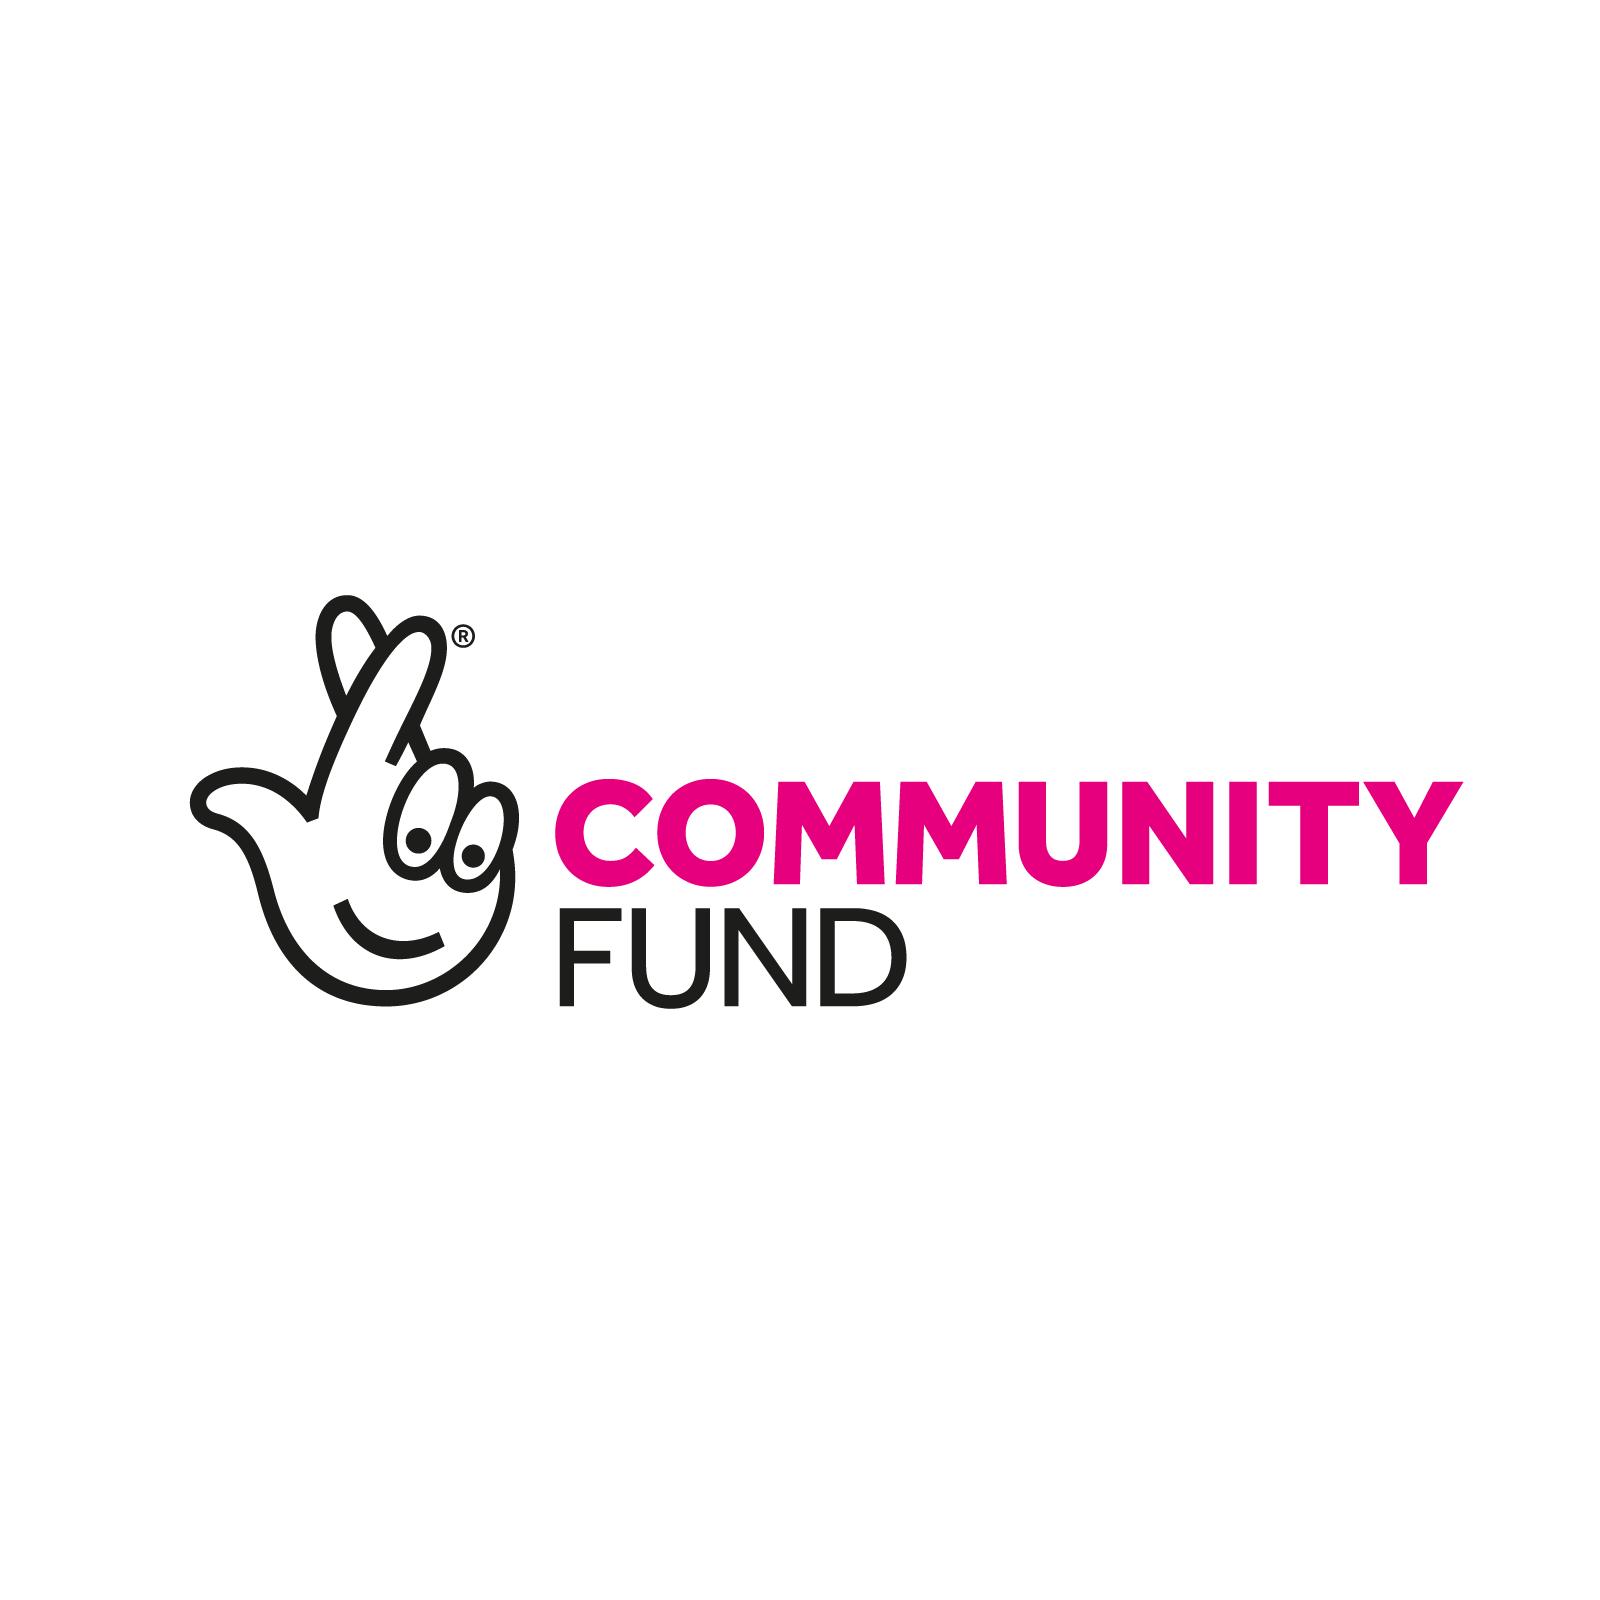 Comunity Fund